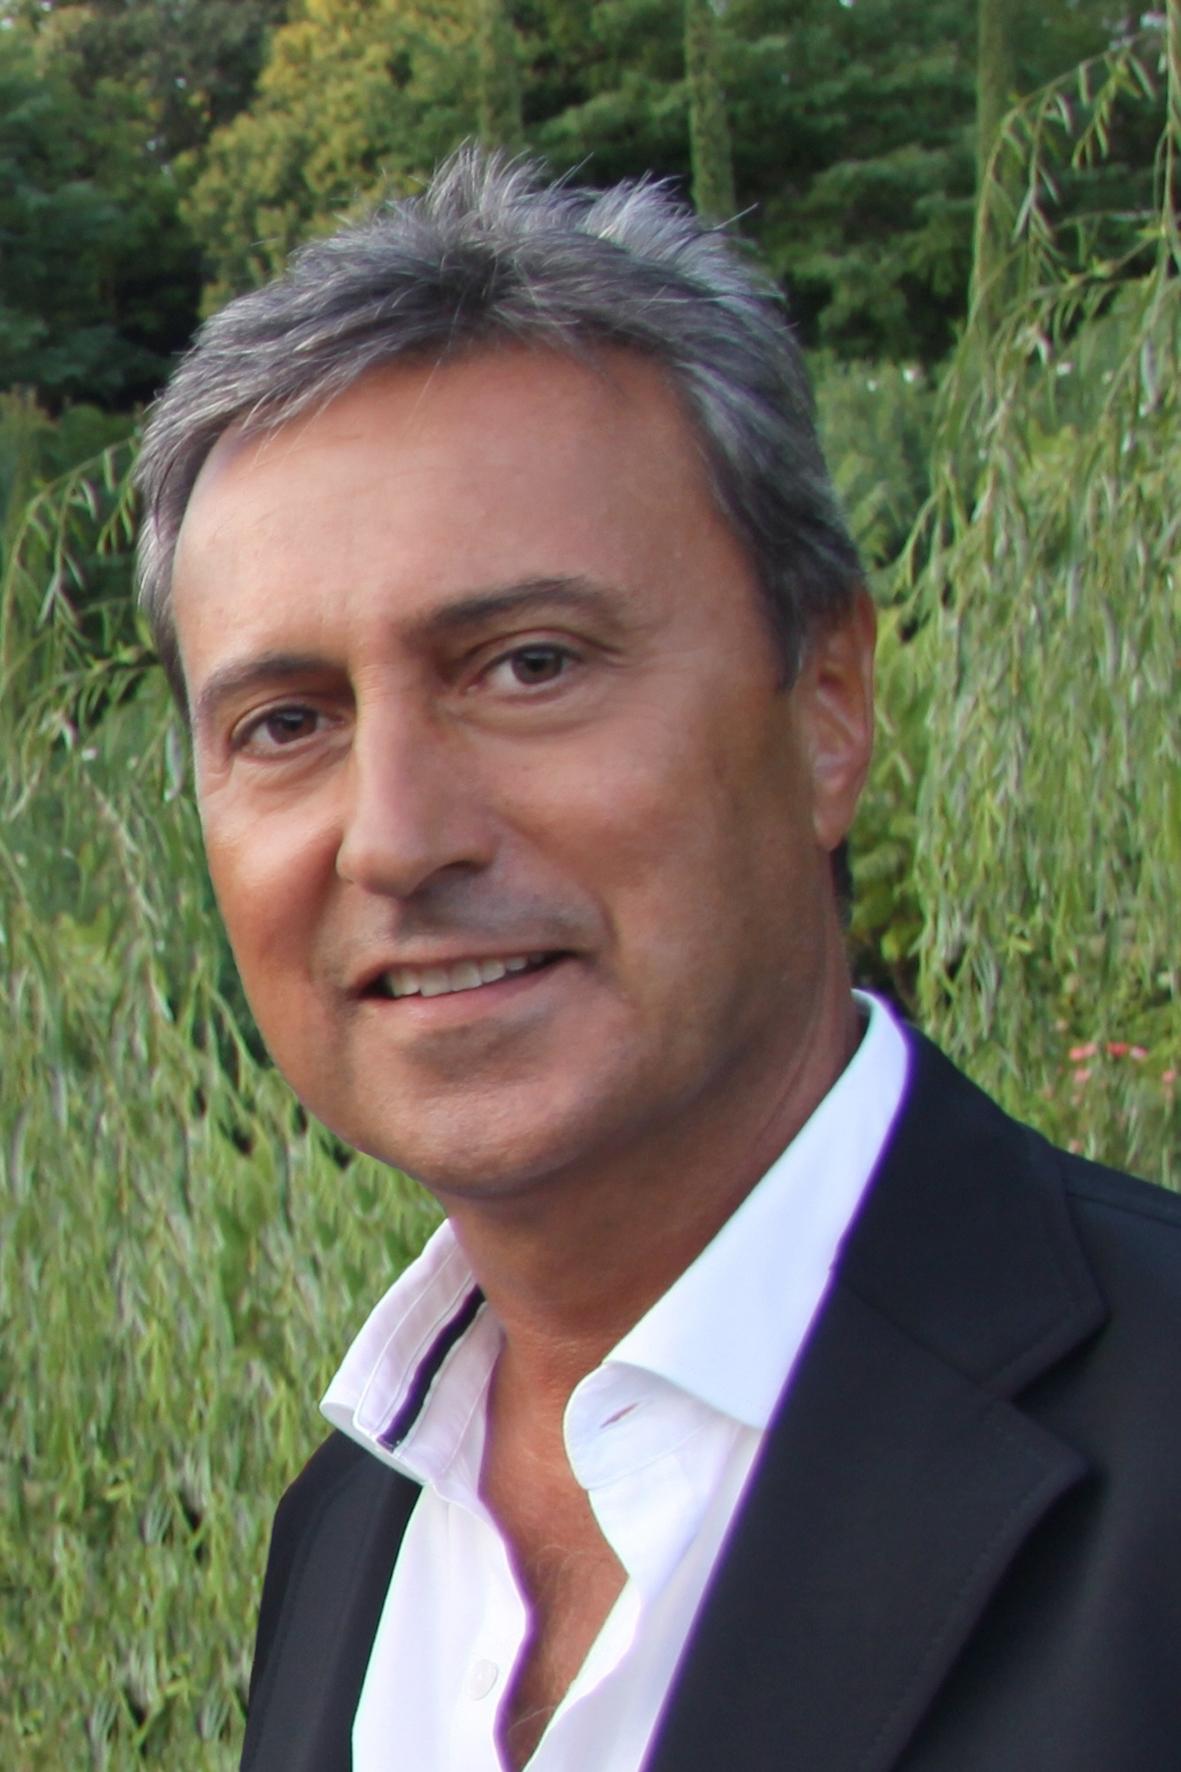 Dott. Claudio Pagliari